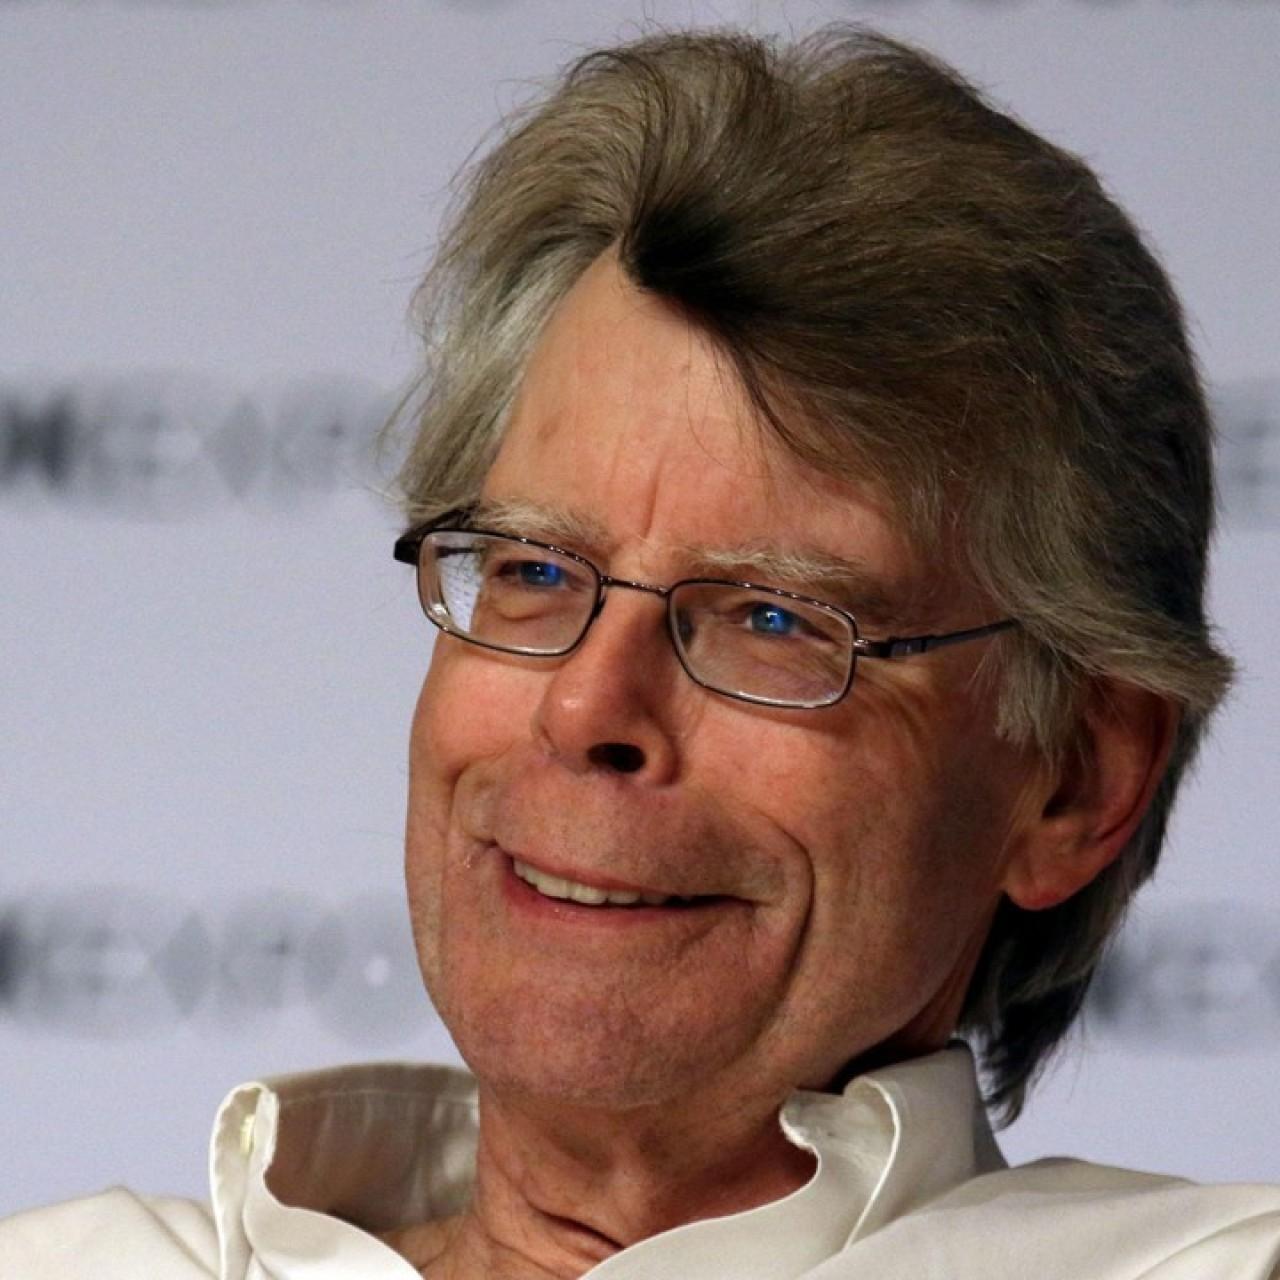 Stephen King's The Outsider: murderous crime fiction marred